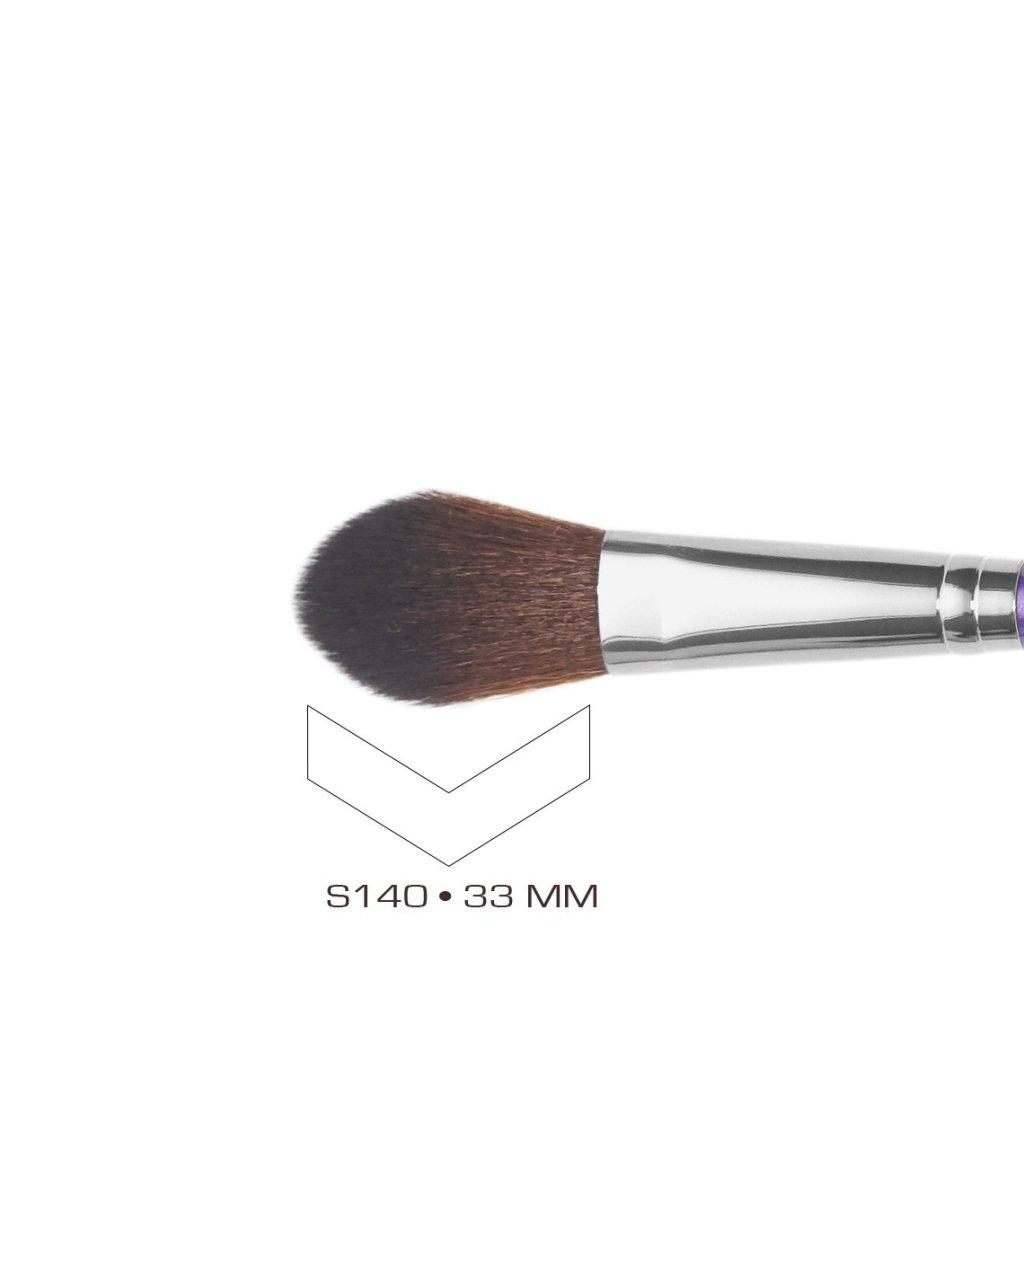 S140 Highlight Stylist